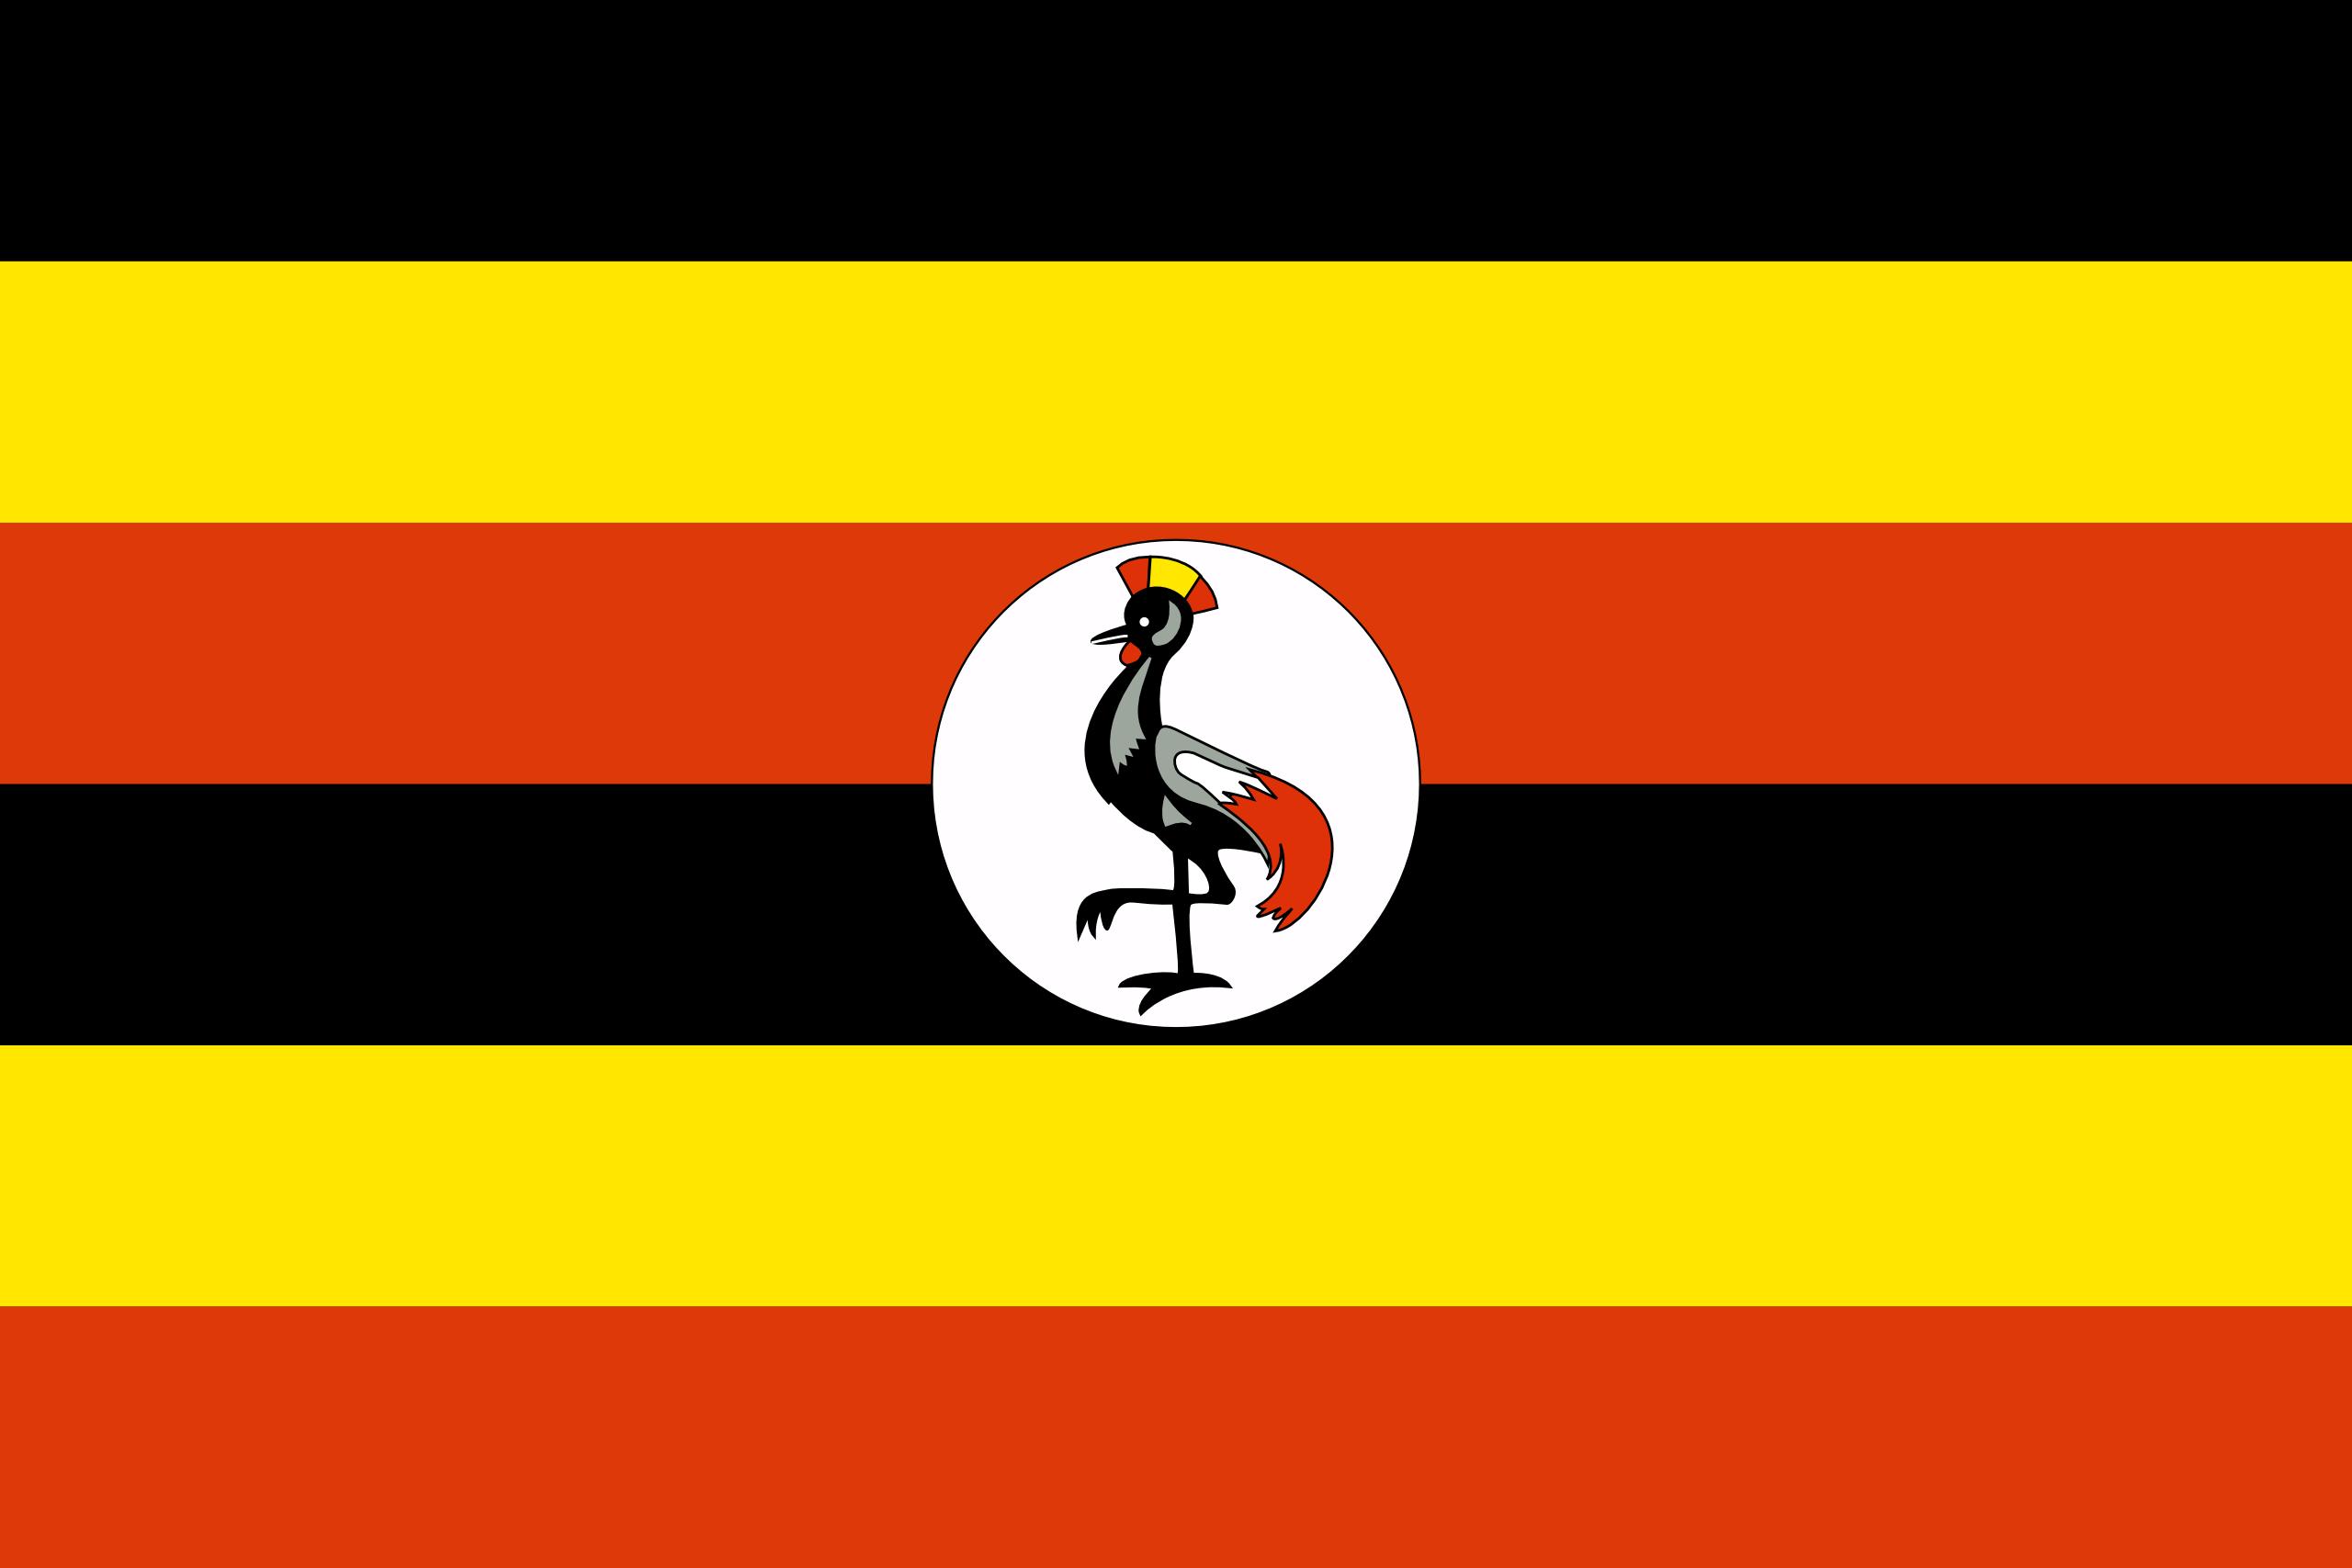 uganda, paese, emblema, logo, simbolo - Sfondi HD - Professor-falken.com